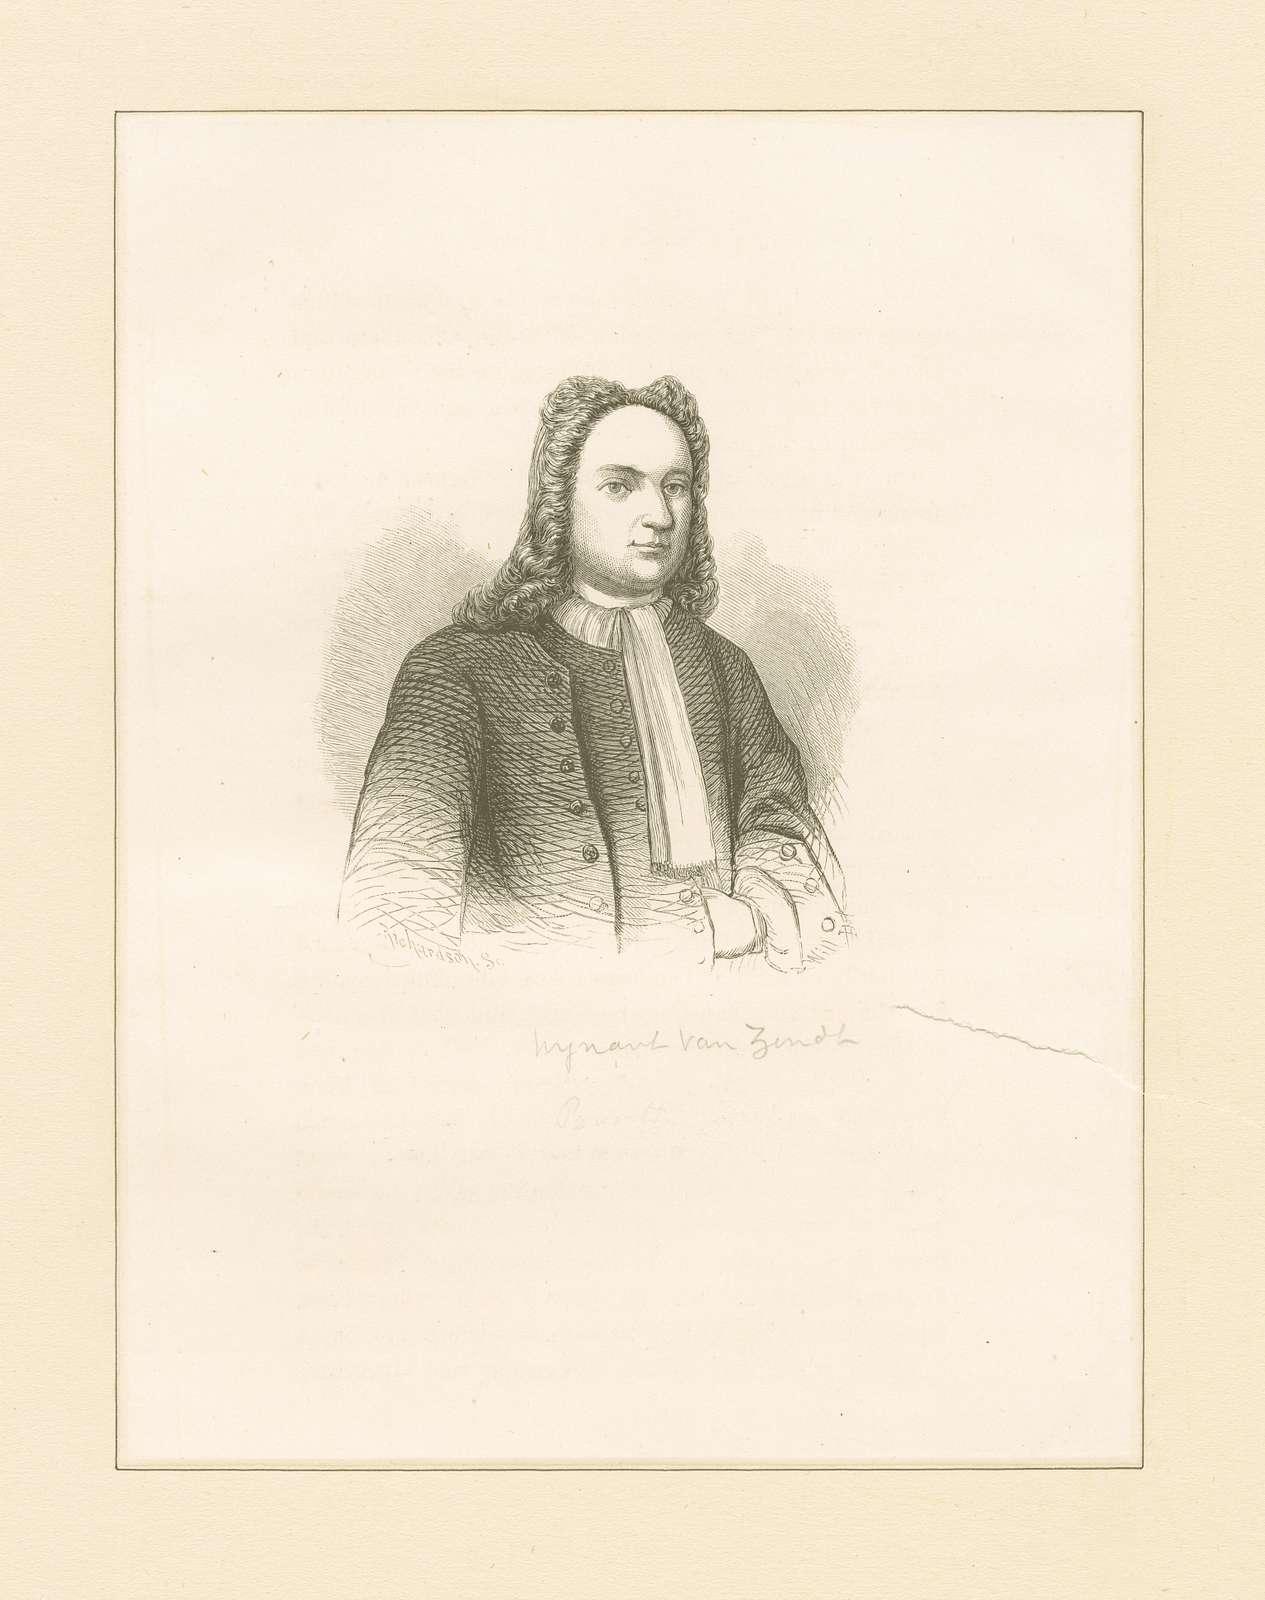 Wynant Van Zandt